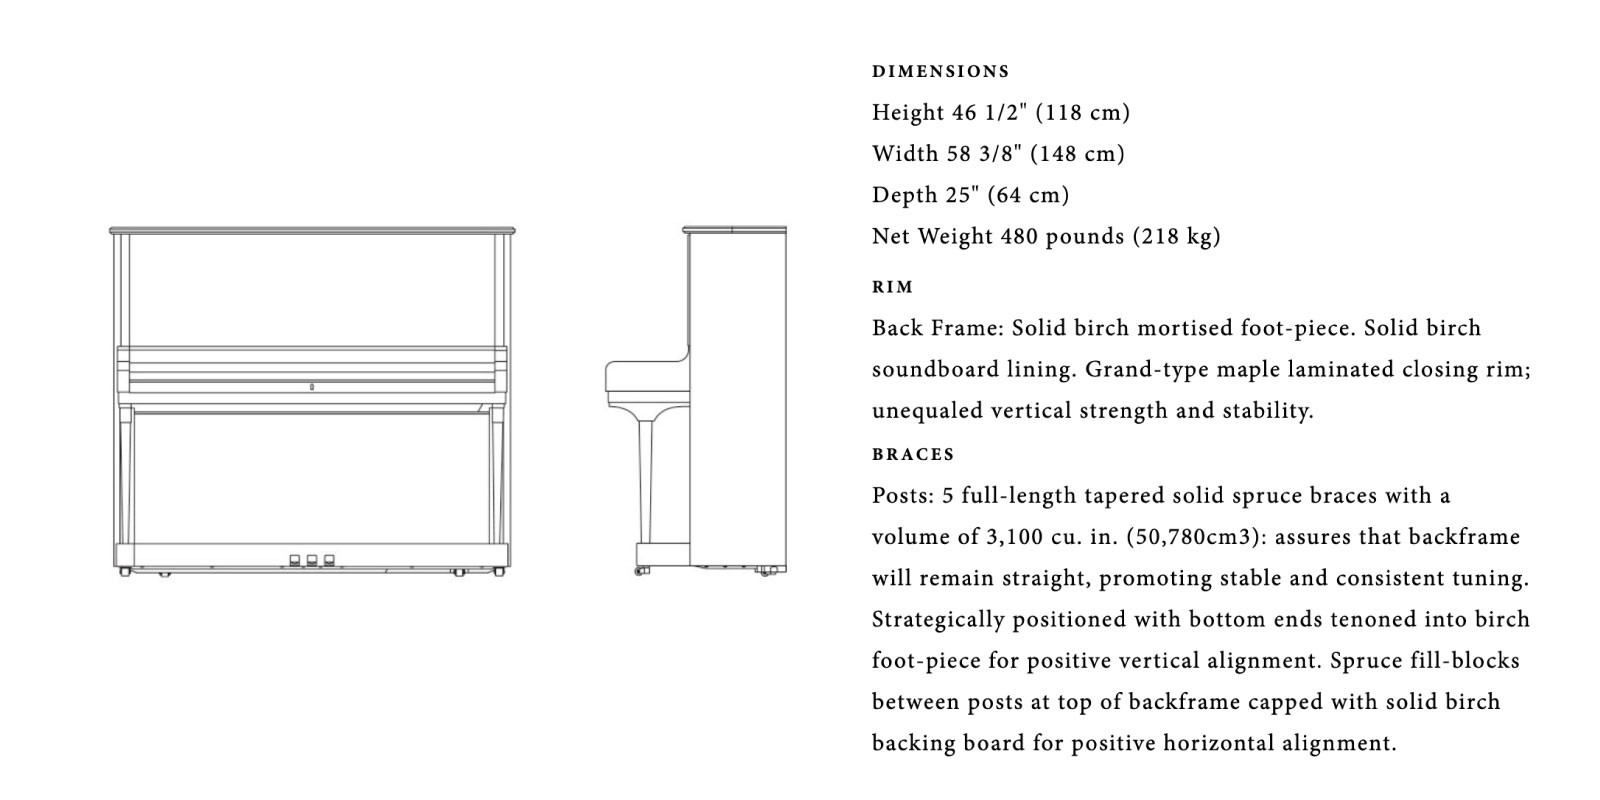 PP-Steinway-MODEL-1098-Details-1.jpg